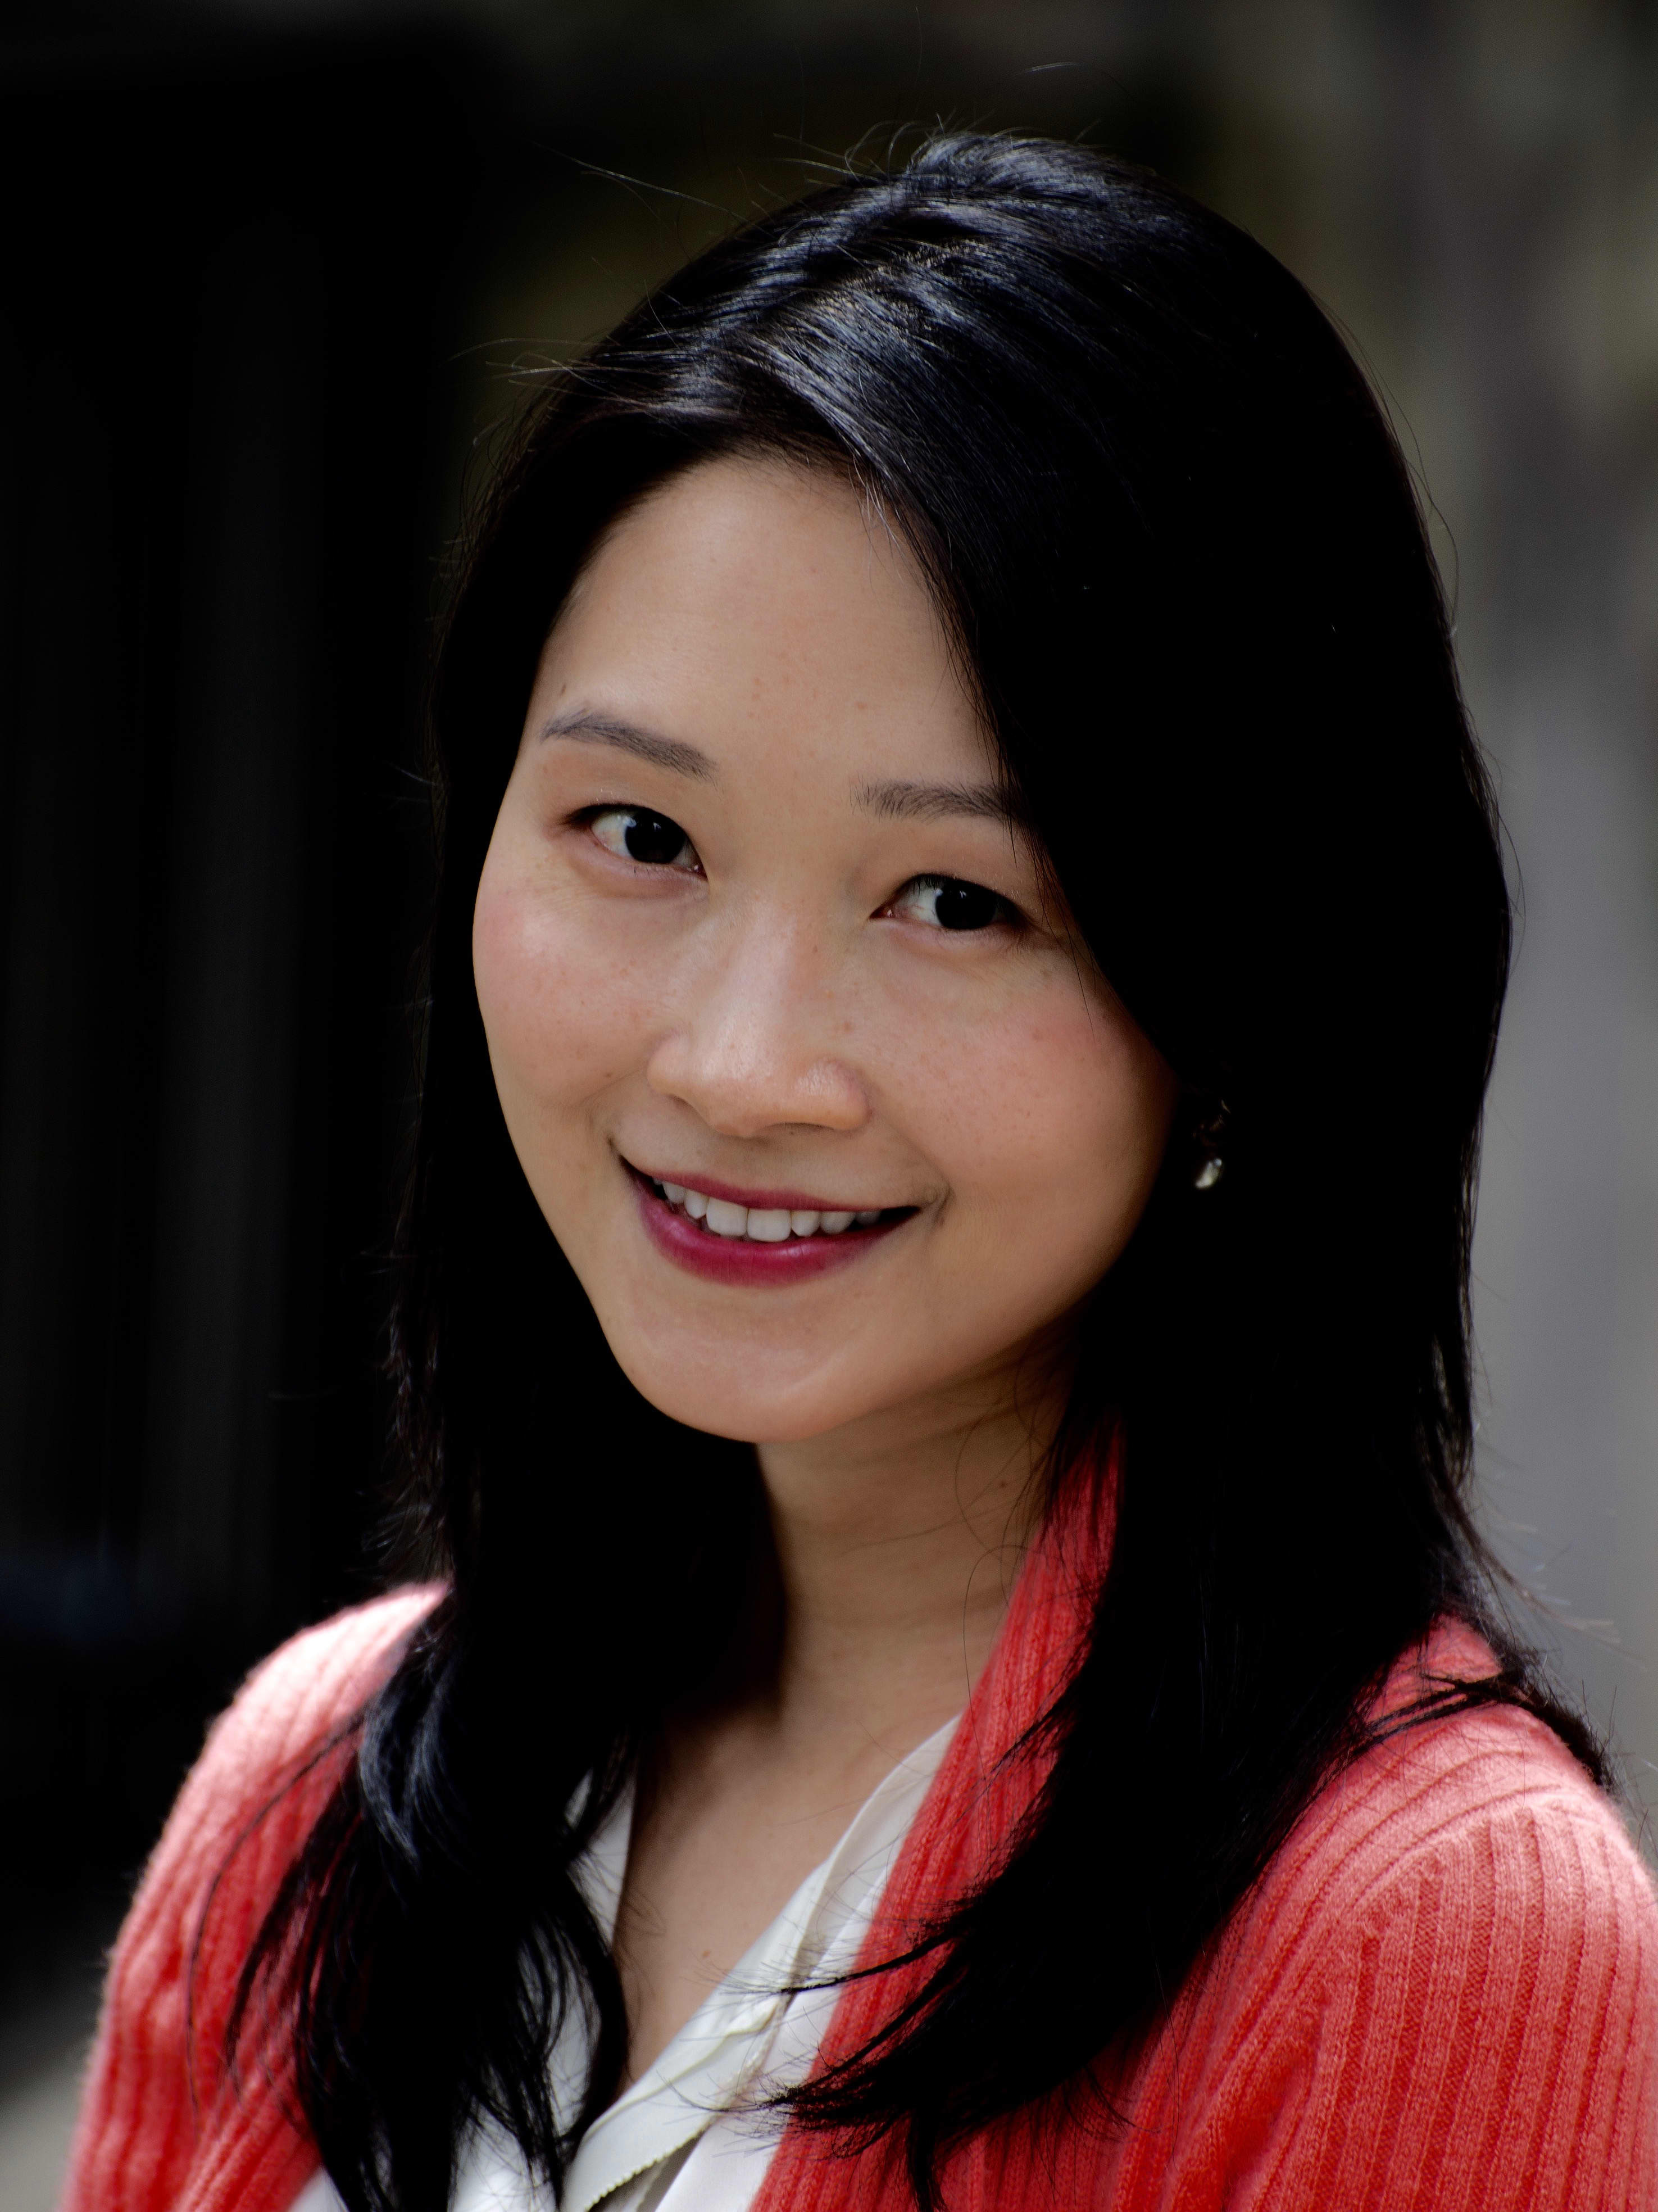 Mina Xu